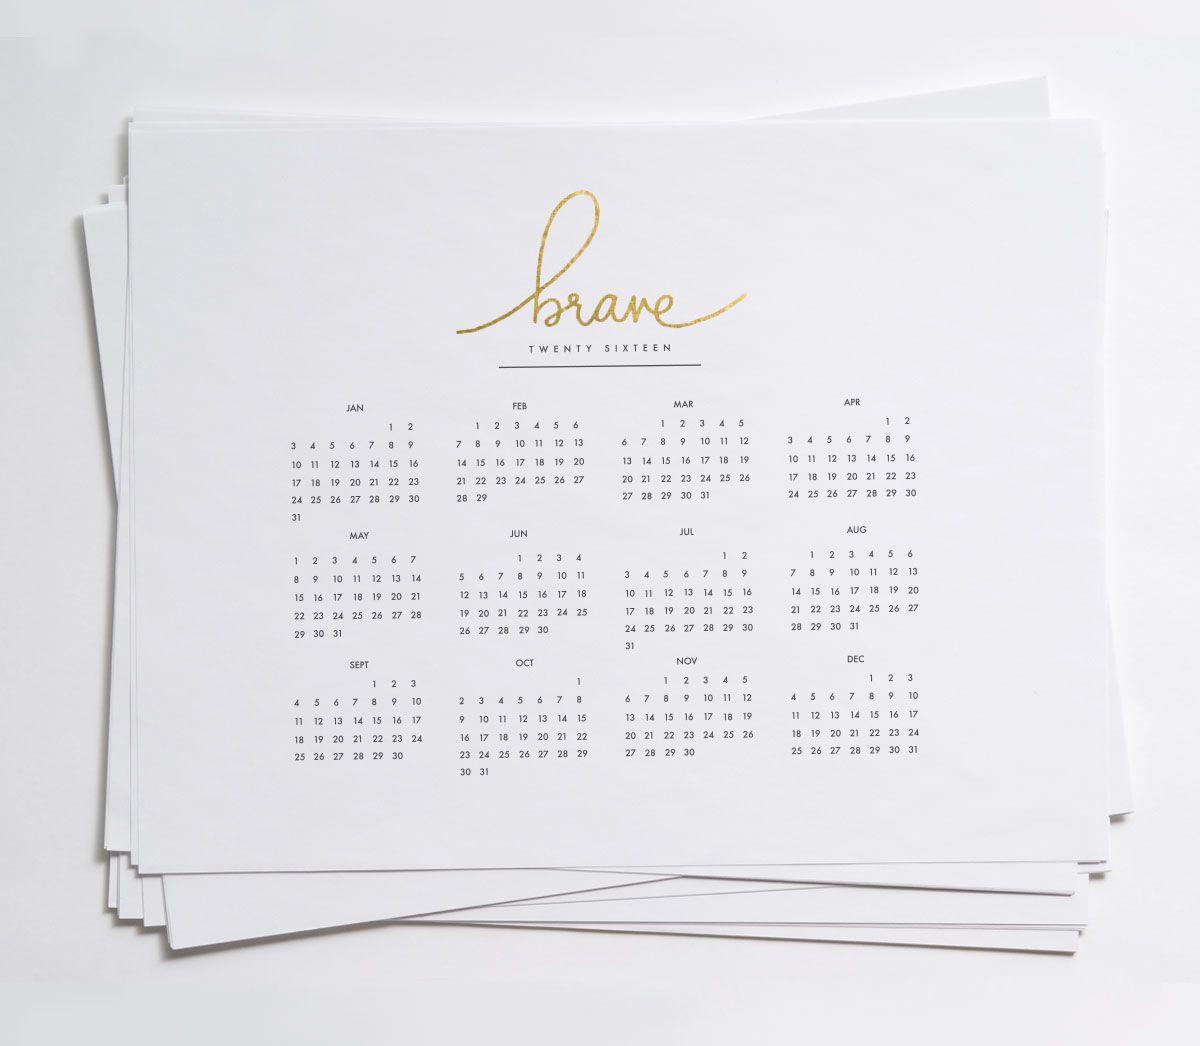 2016 year at a glance calendars printables pinterest